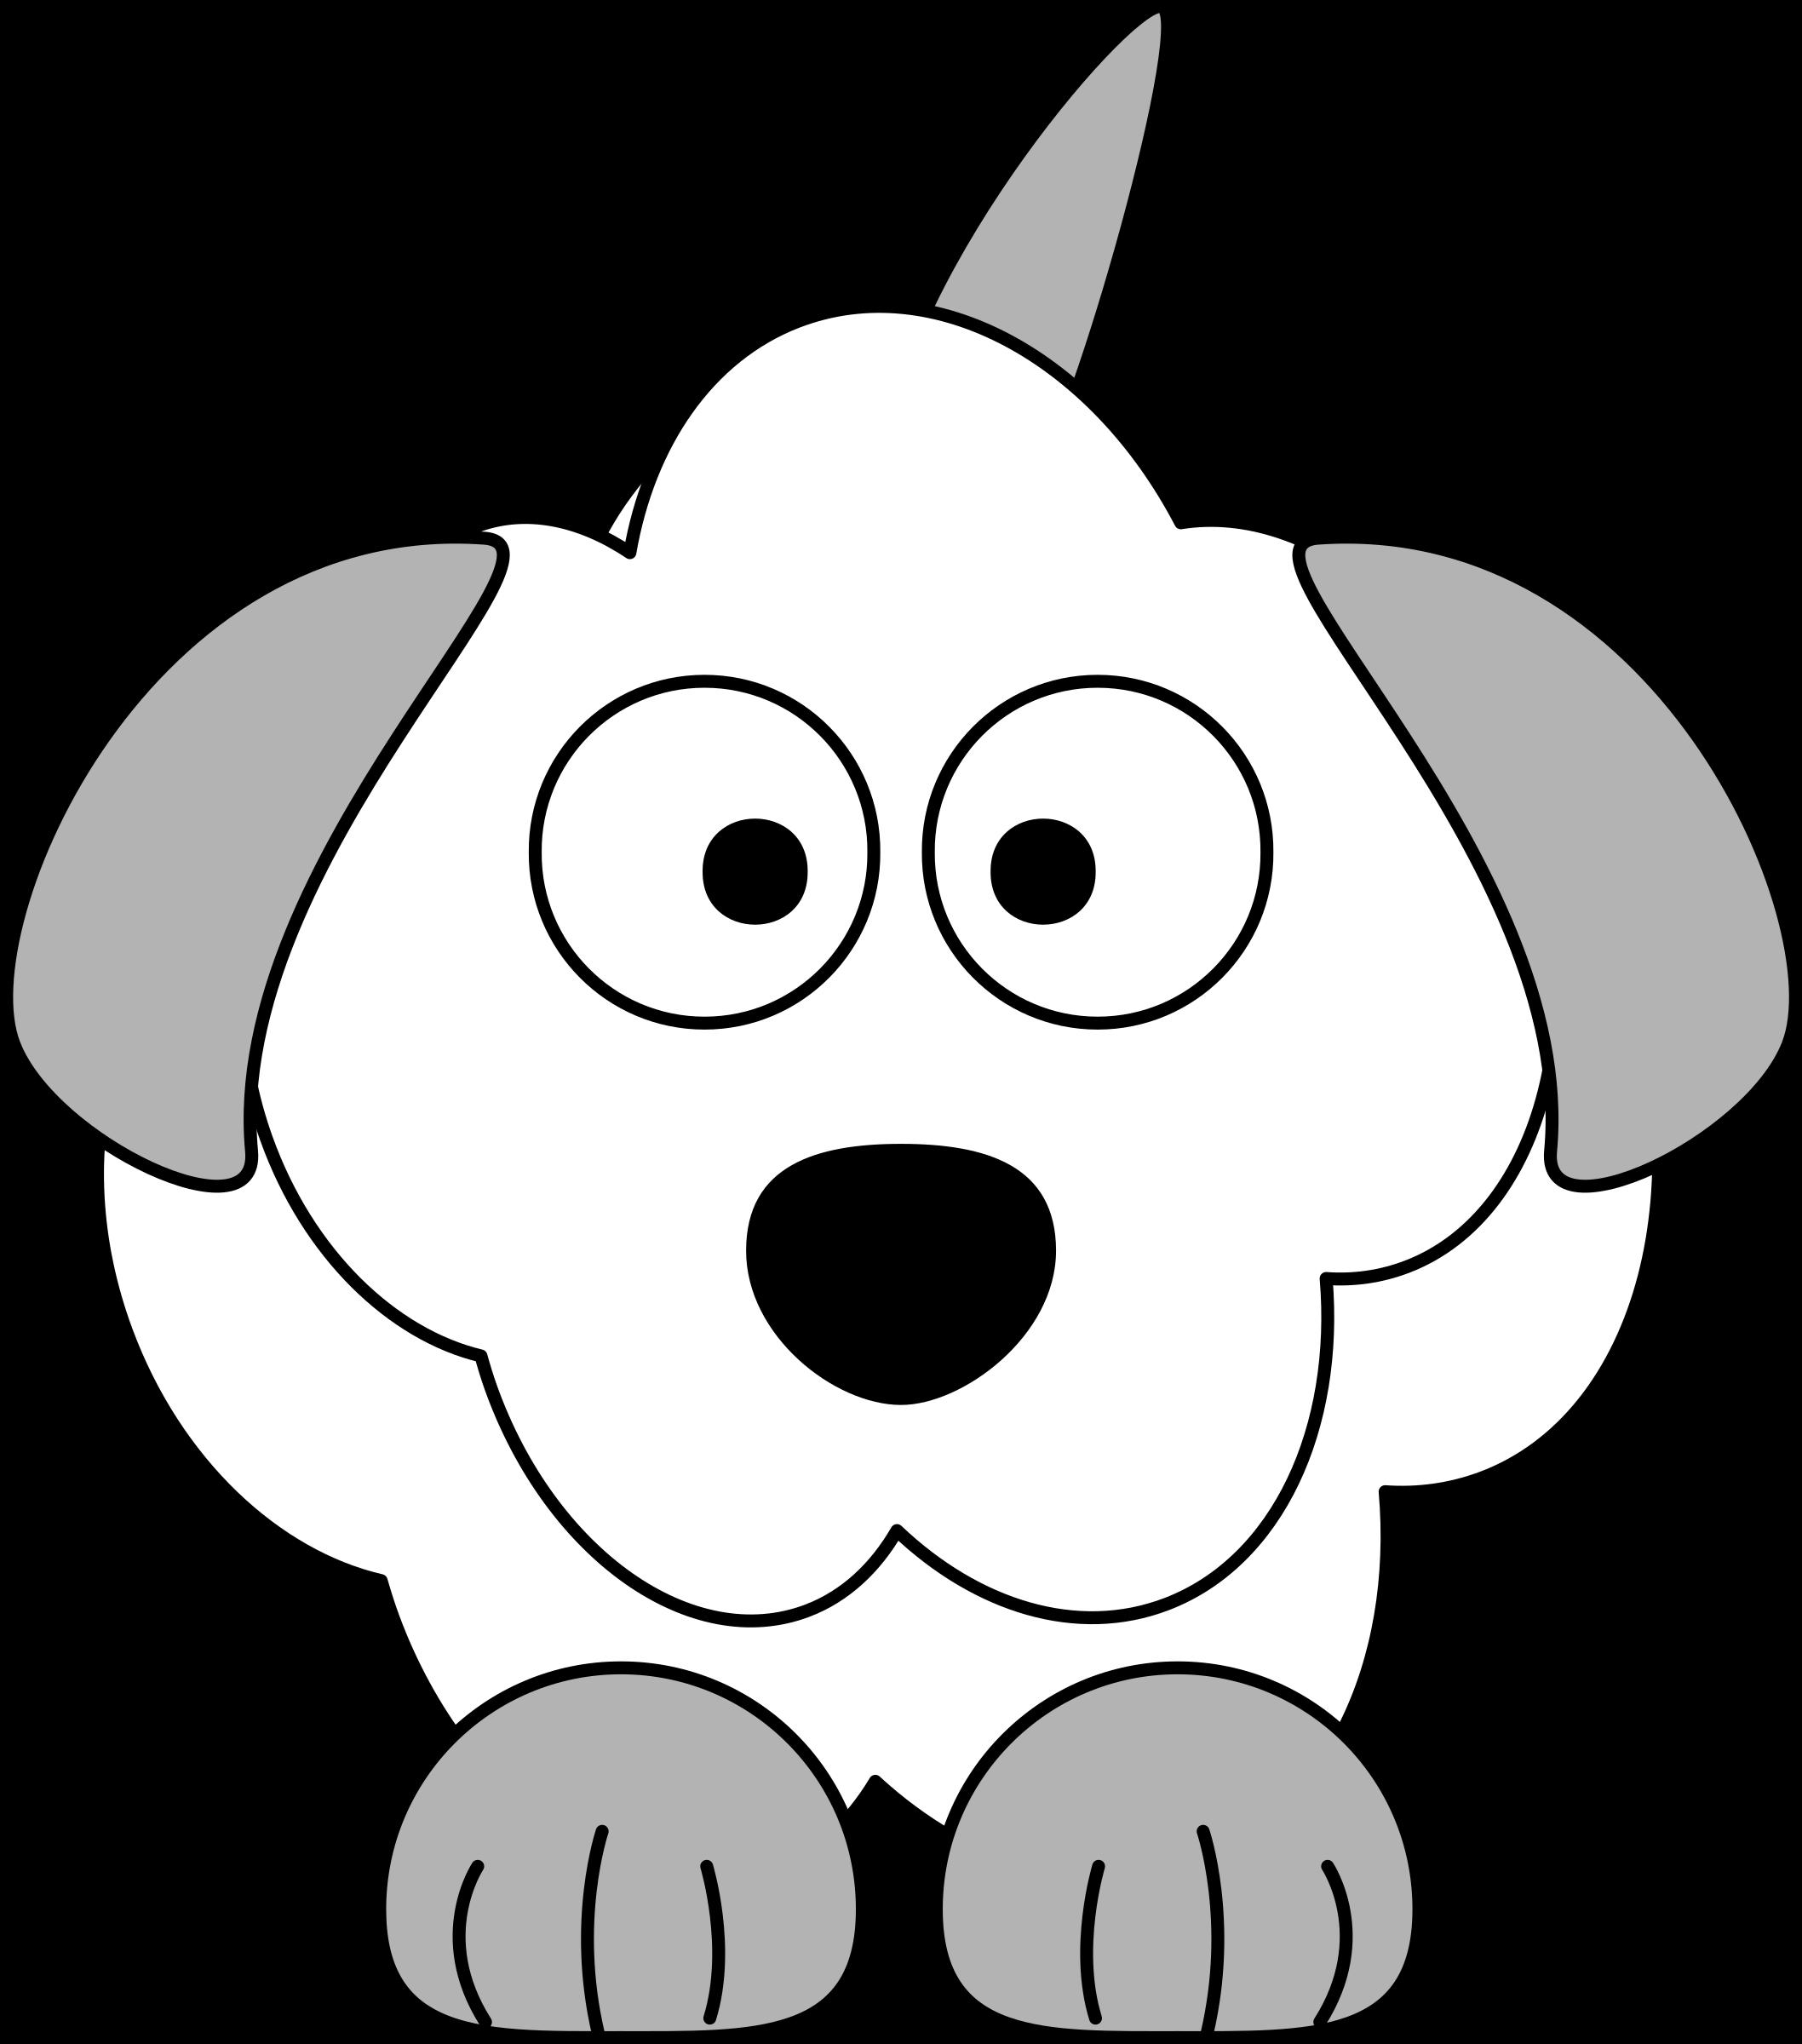 Nose clipart dog\'s, Nose dog\'s Transparent FREE for download.